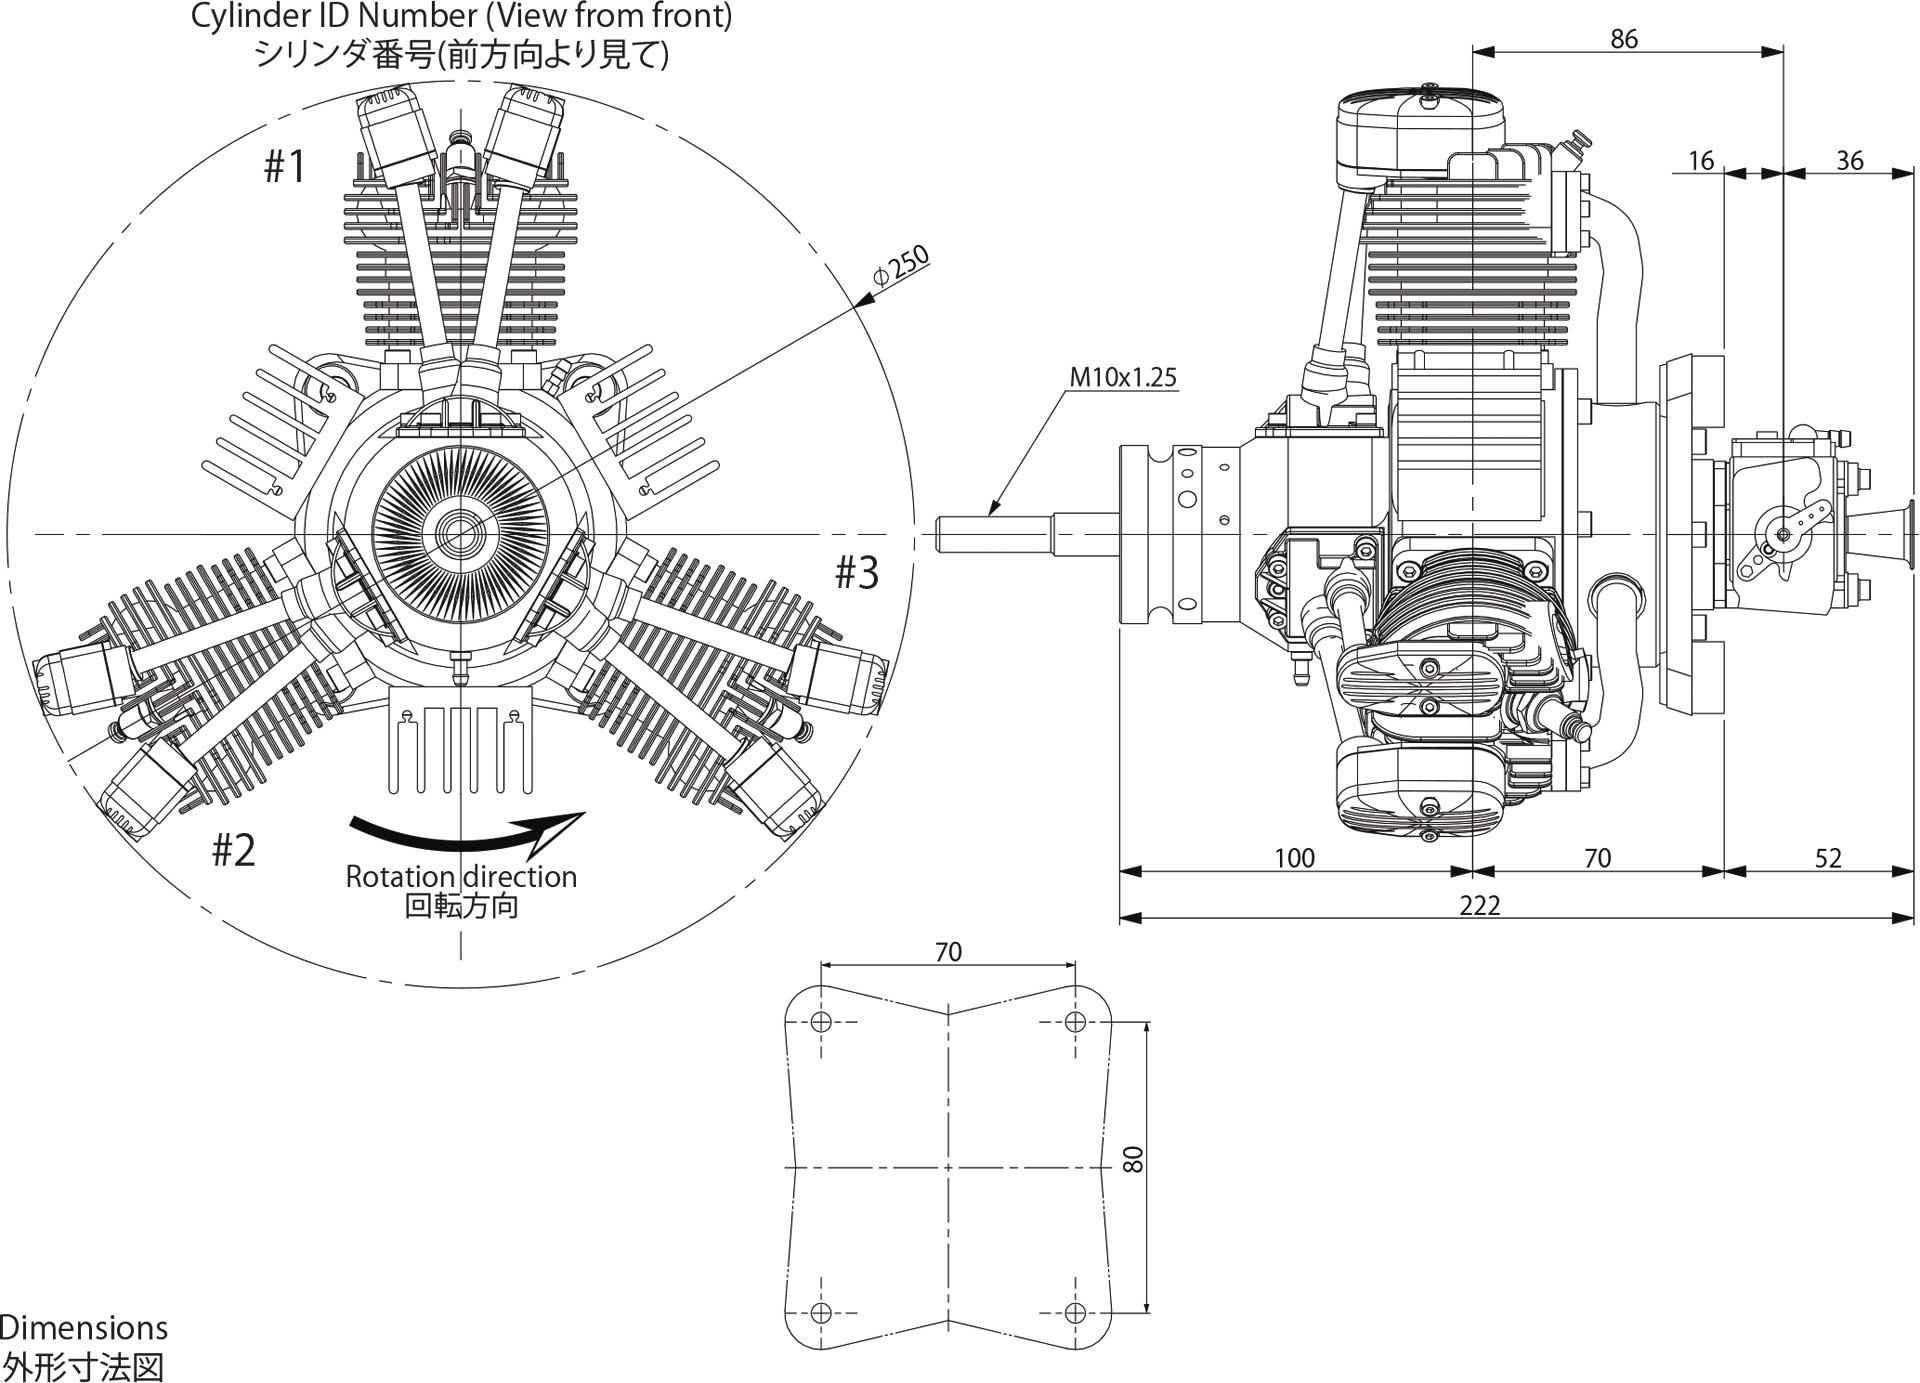 SAITO FG-90R3 BENZIN STERNMOTOR 3-ZYLINDER